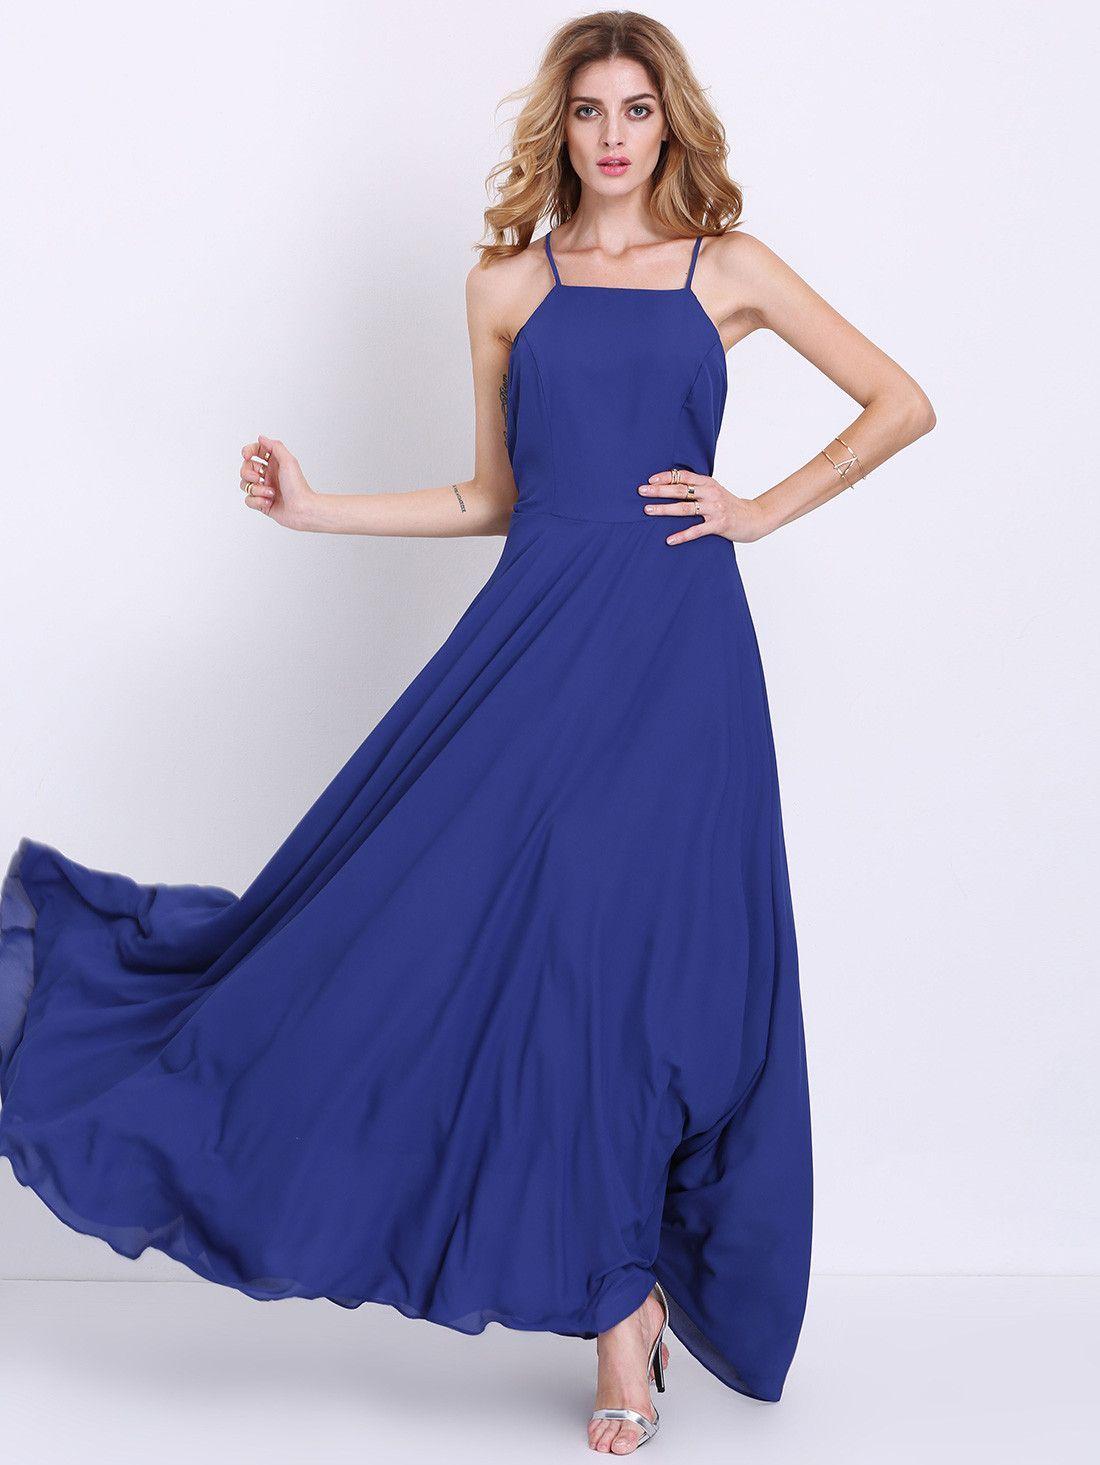 Blue spaghetti strap backless maxi dress backless maxi